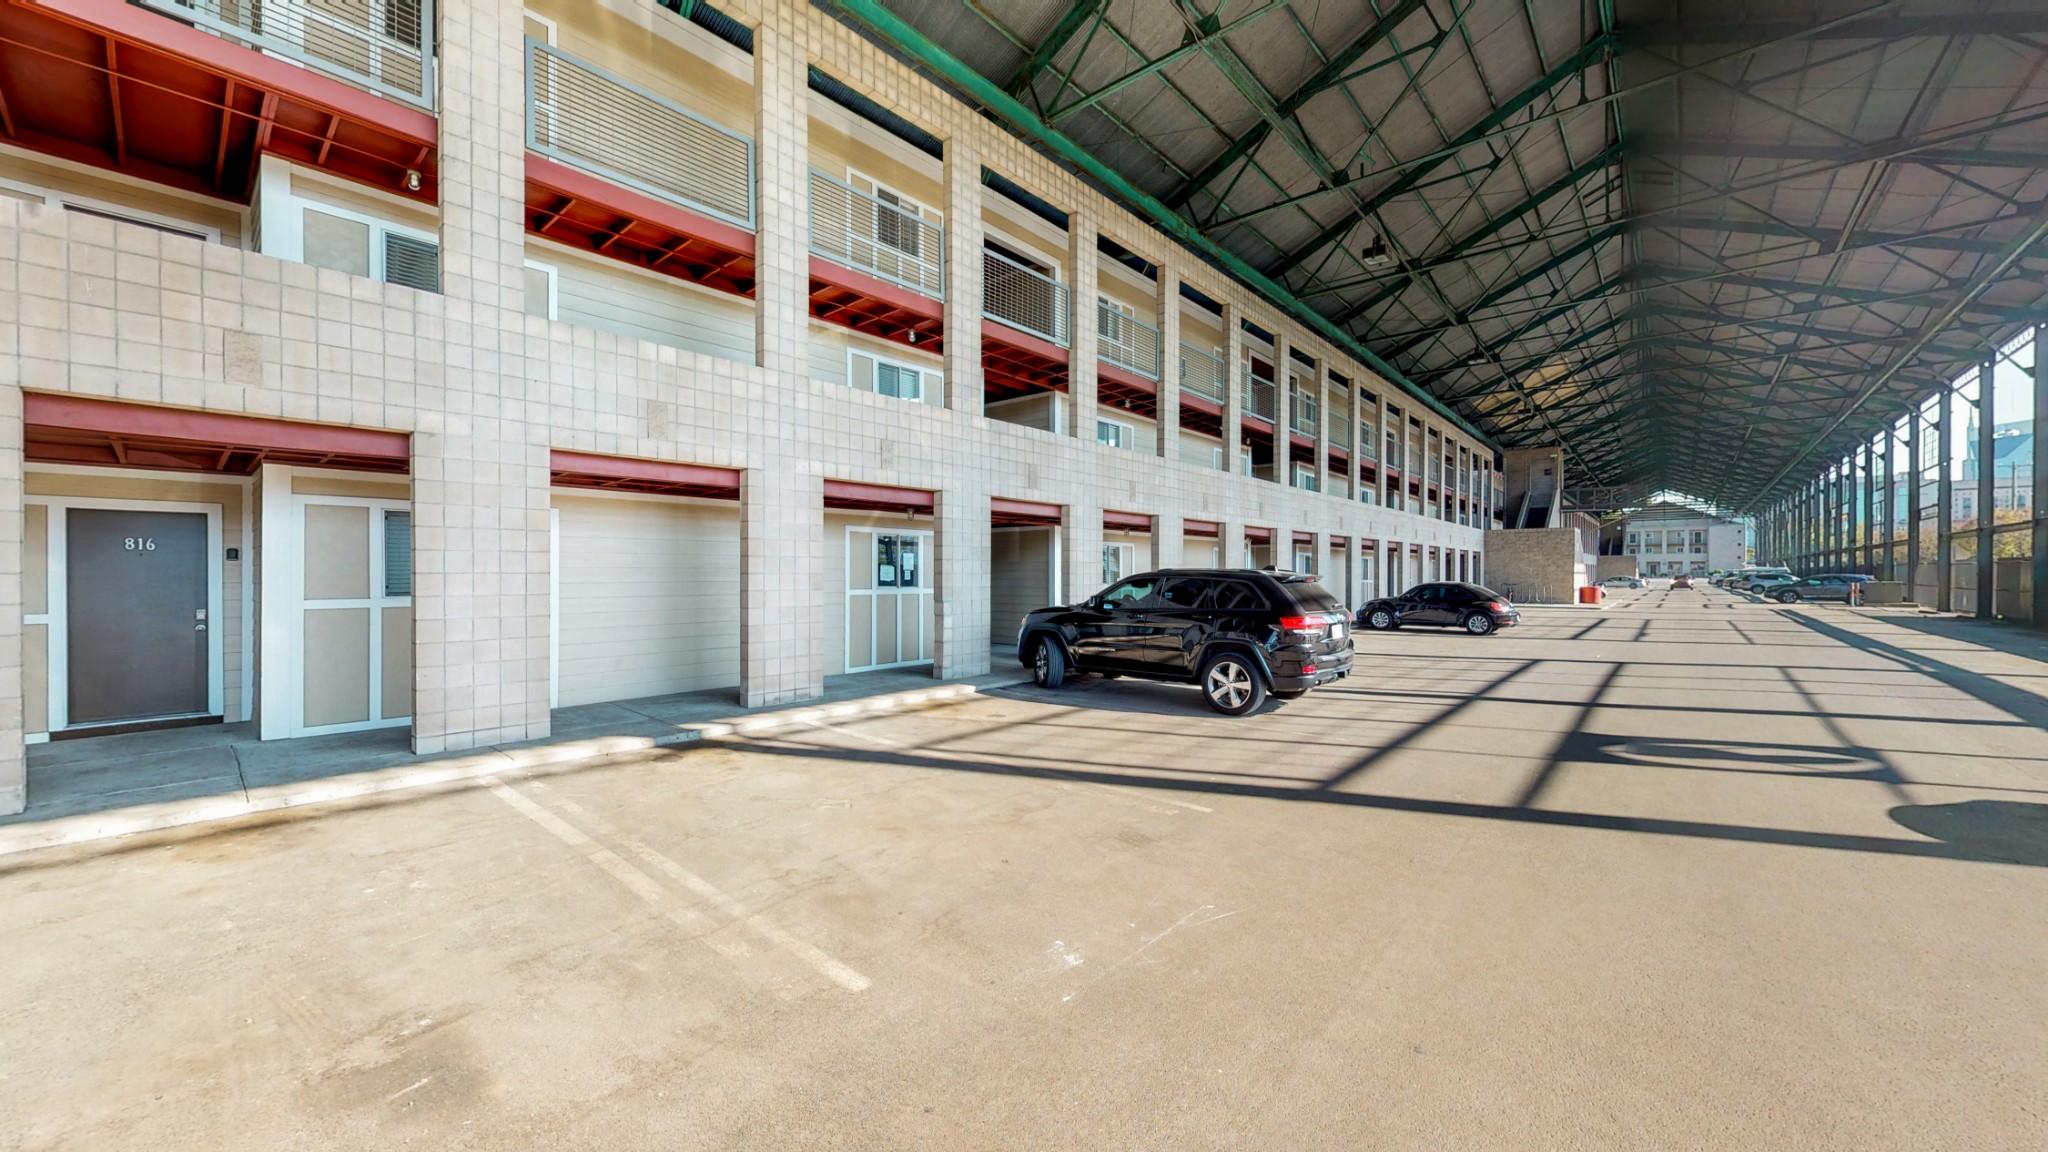 816 1St Ave N, Nashville, TN 37201 - Nashville, TN real estate listing